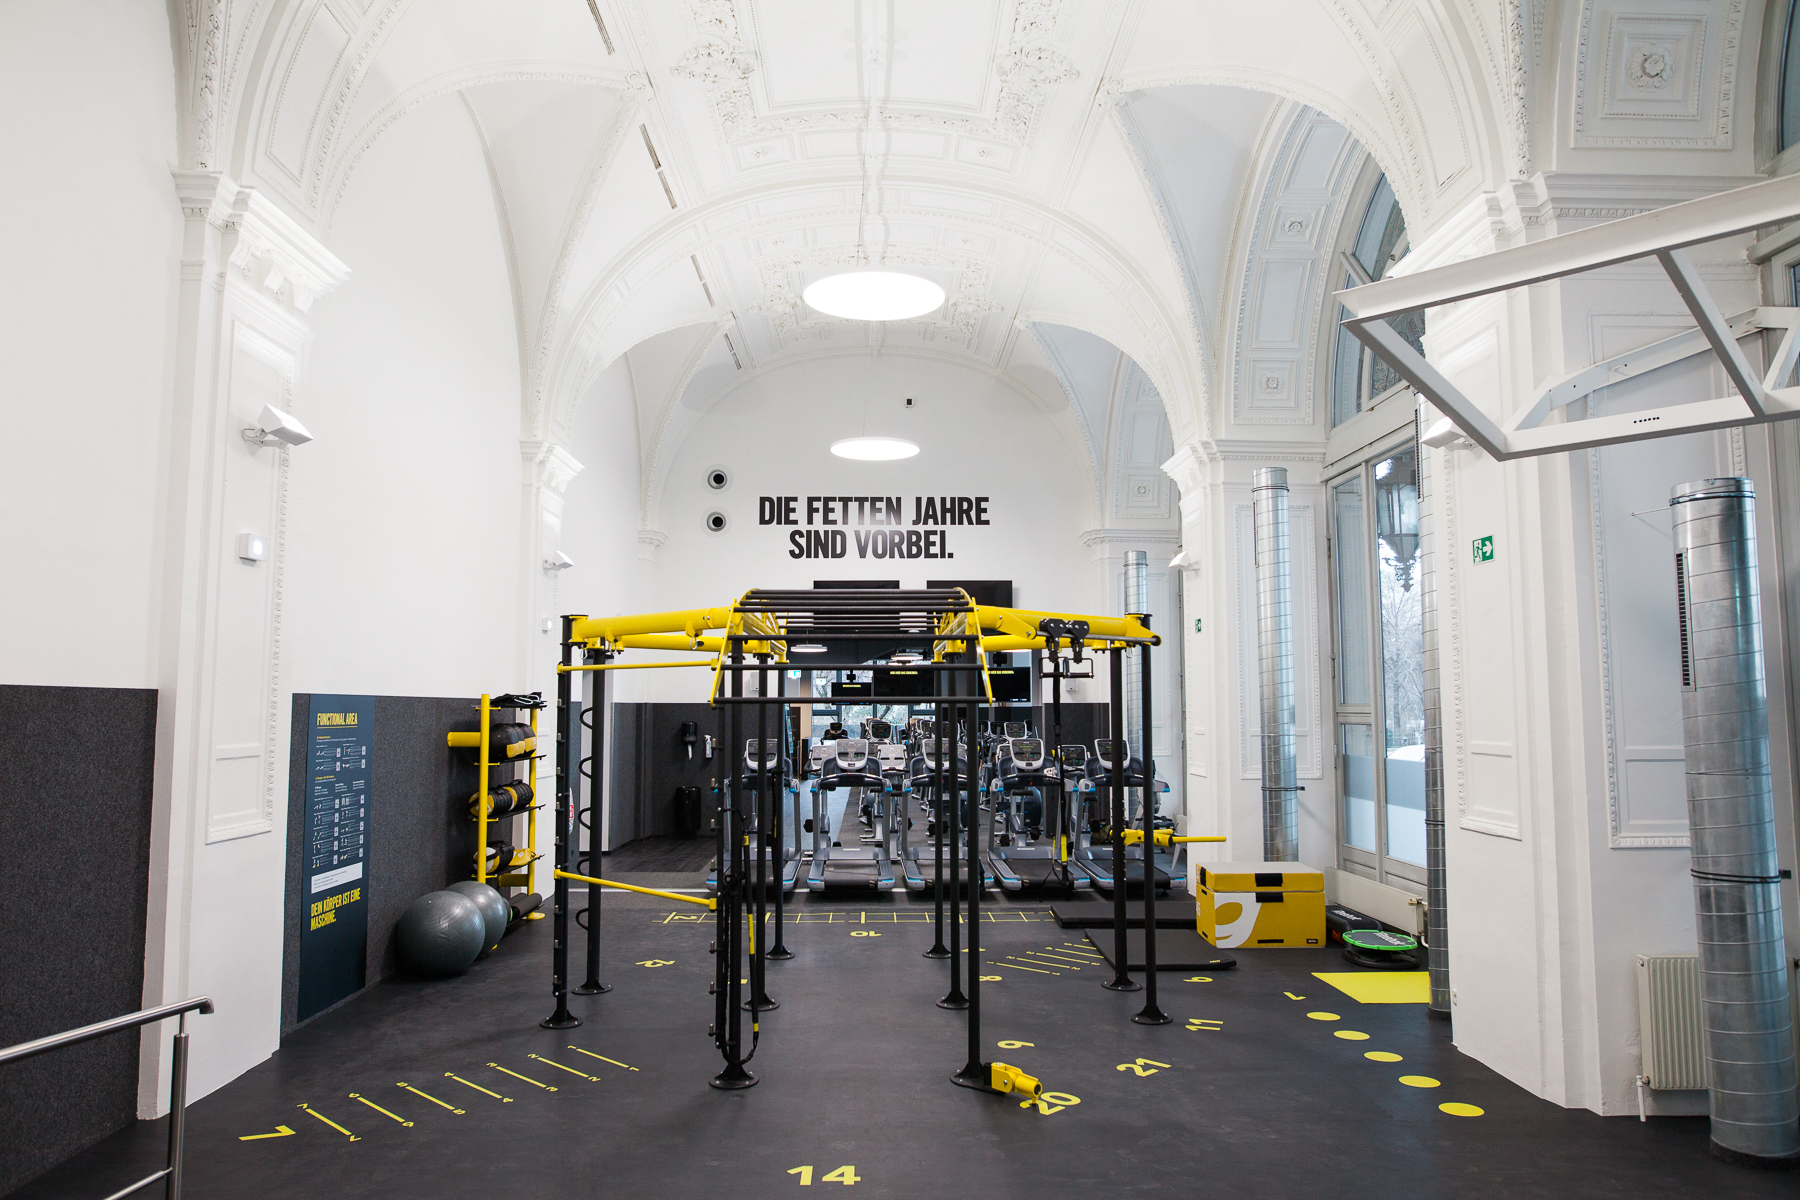 Personal Trainer, 1210, Wien, abnehmen, Gewicht